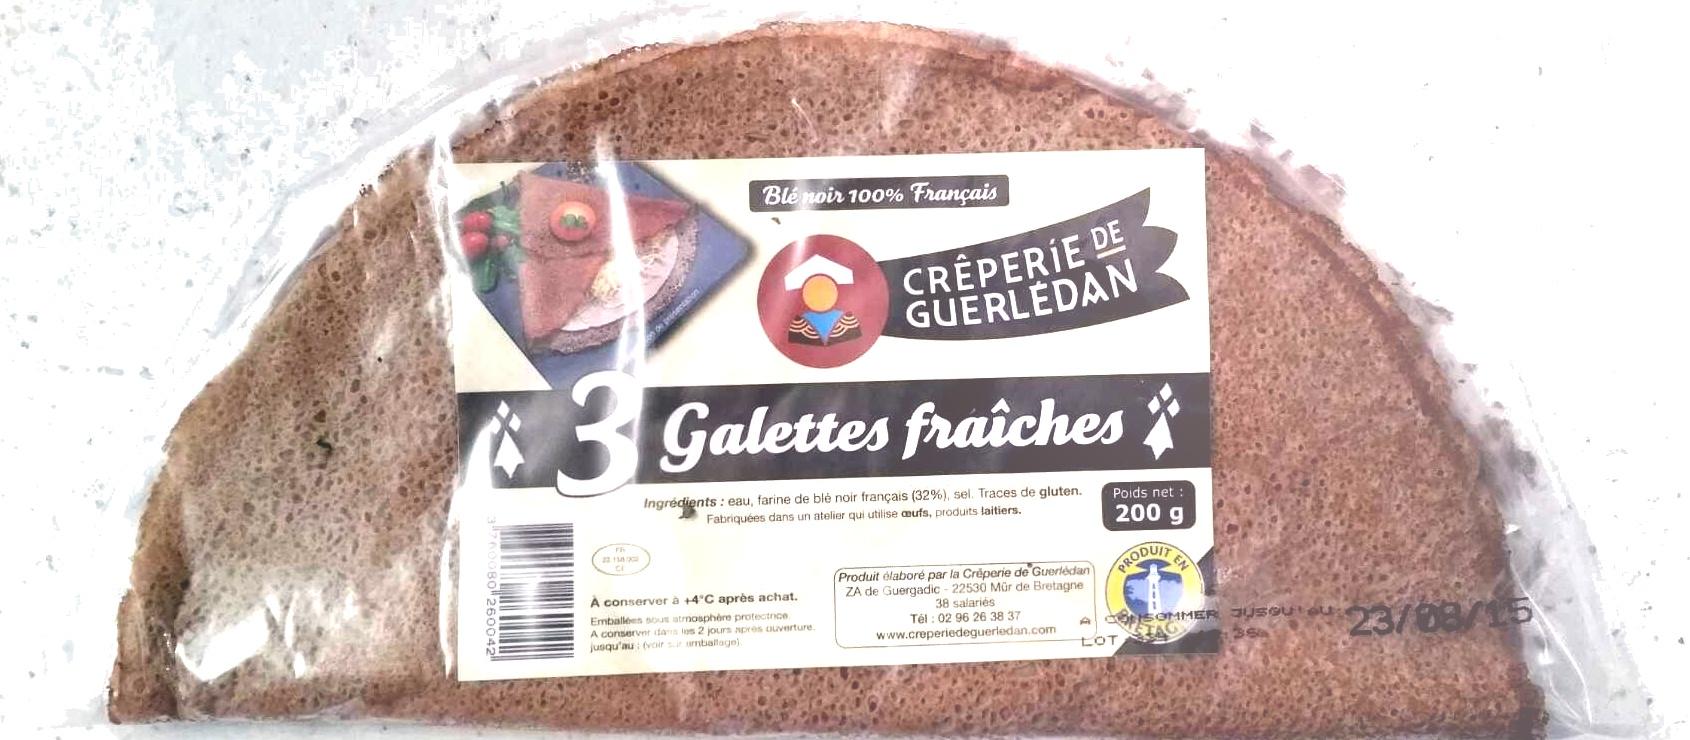 3 Galettes fraîches - Product - fr